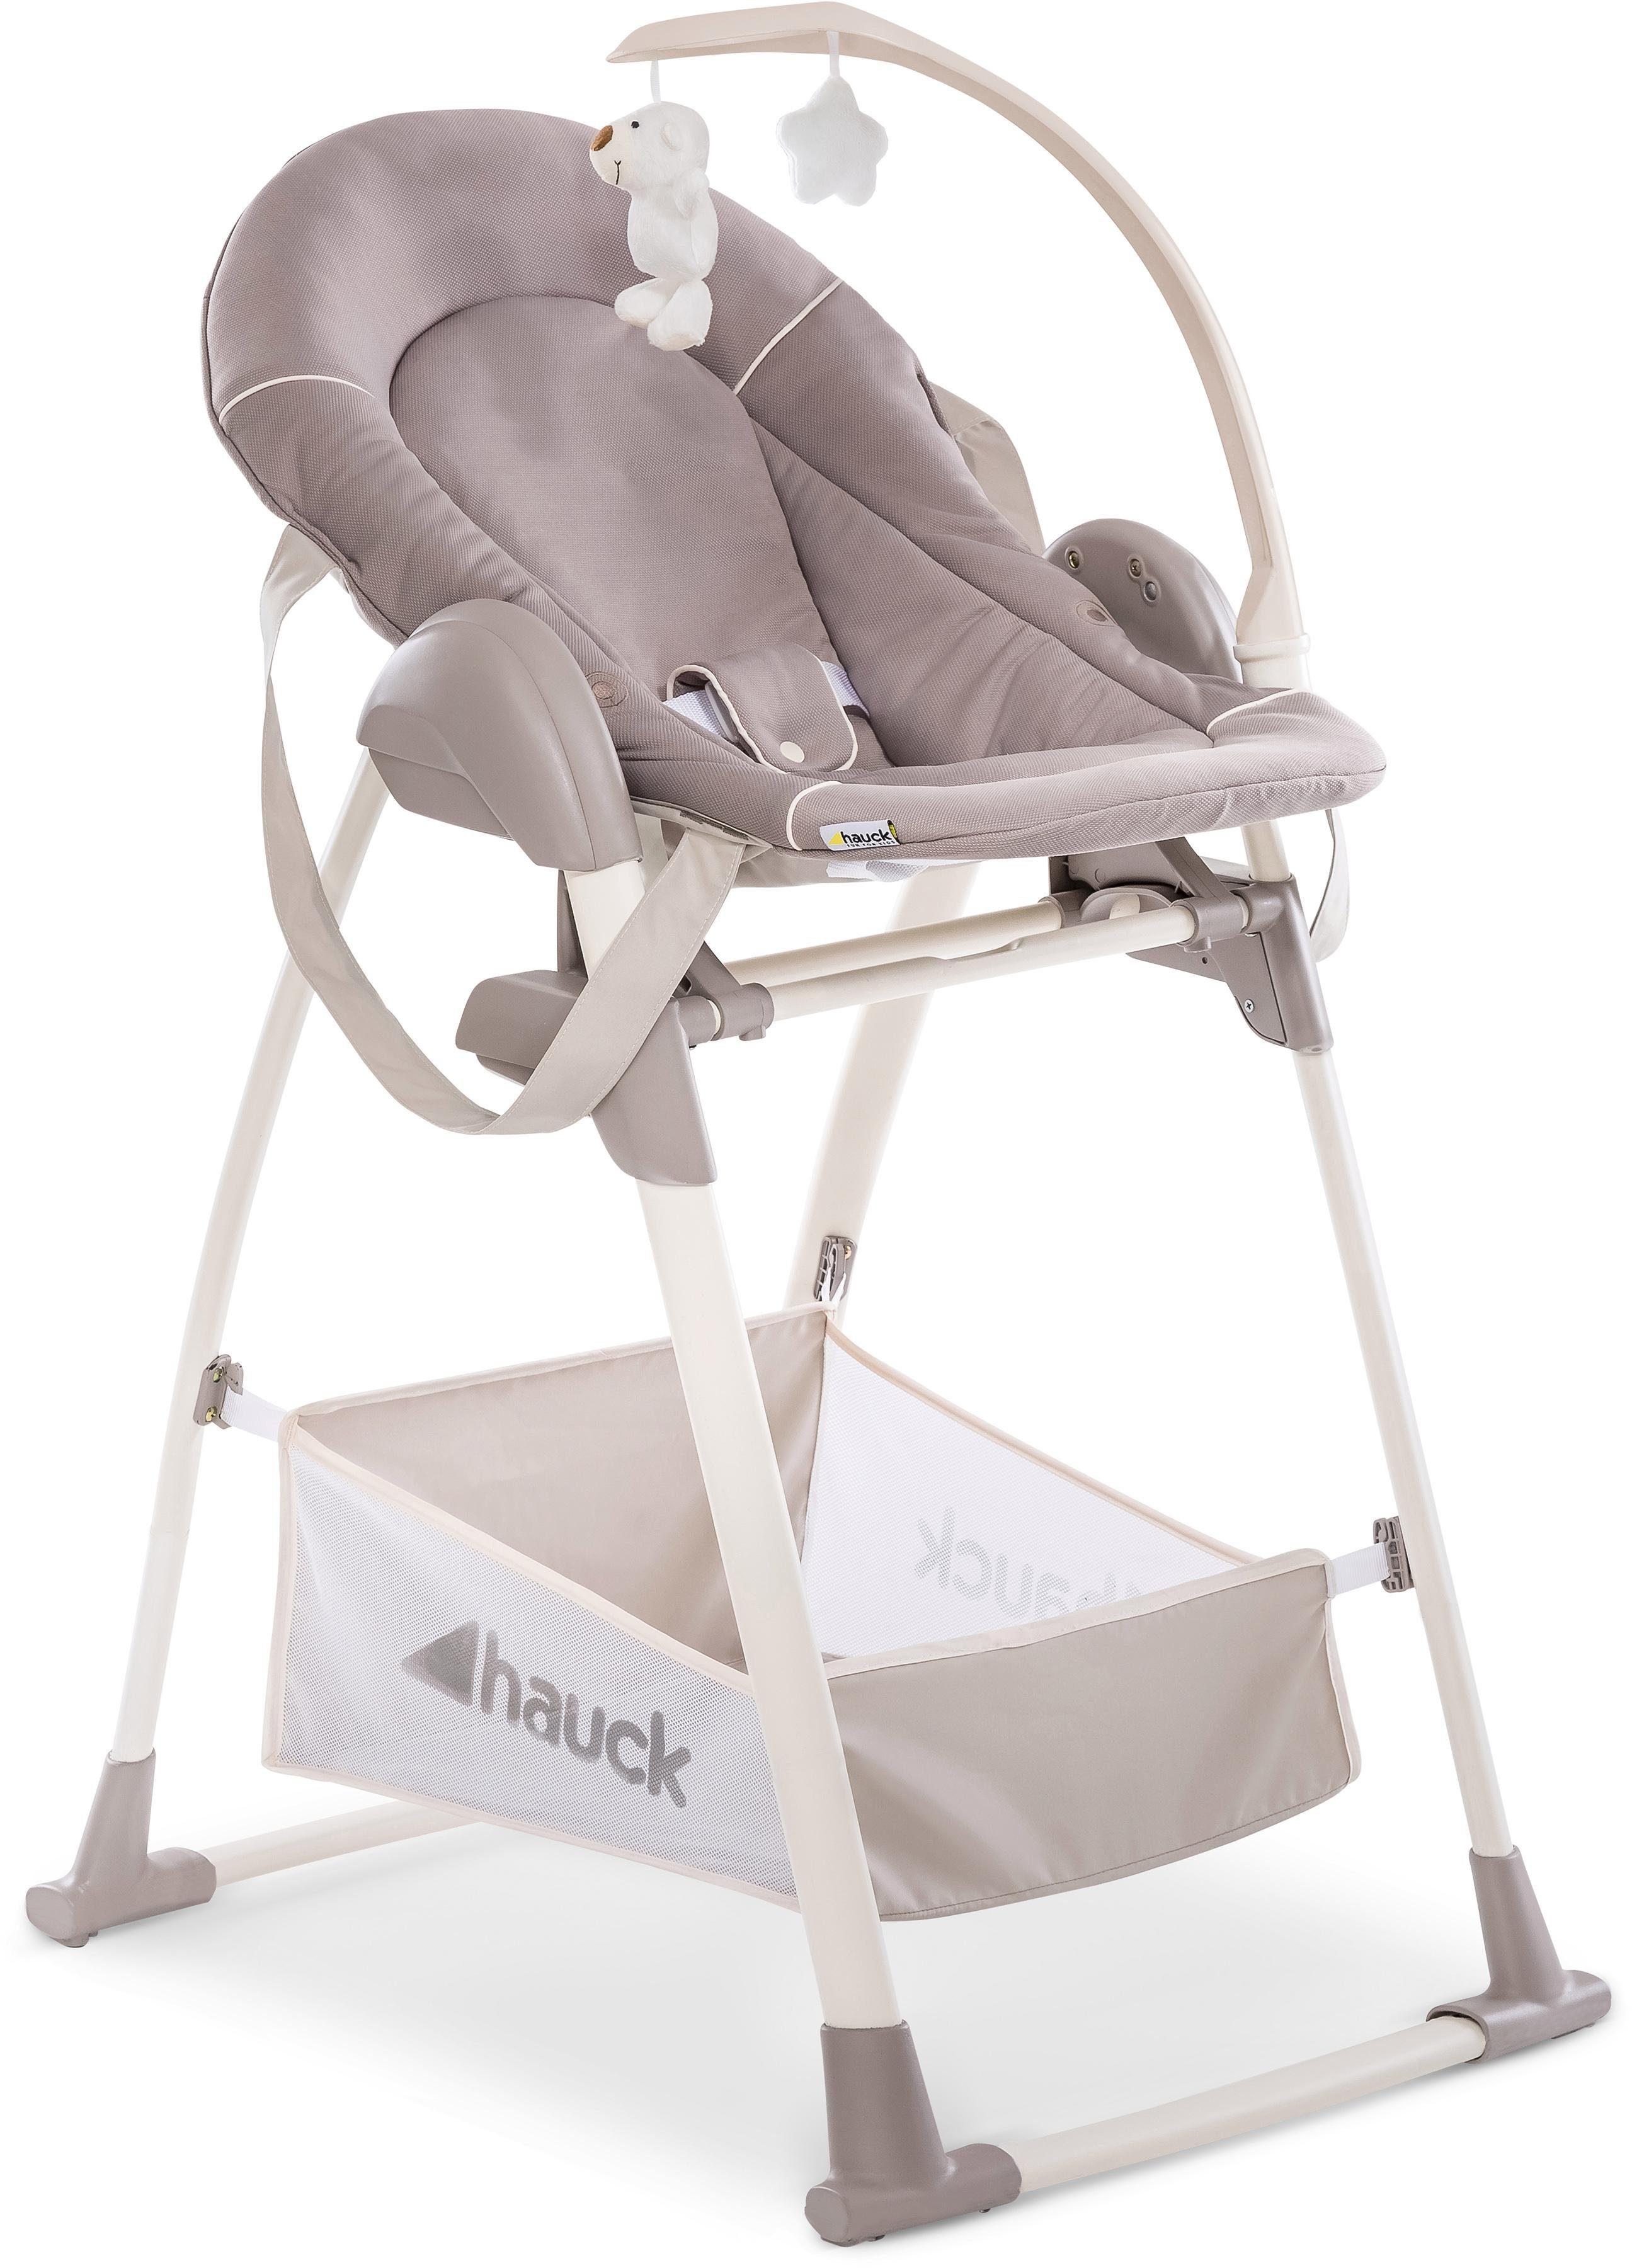 hauck FUN FOR KIDS Kombi Hochstuhl, »Sit`n Relax 3in1, Stretch Beige«